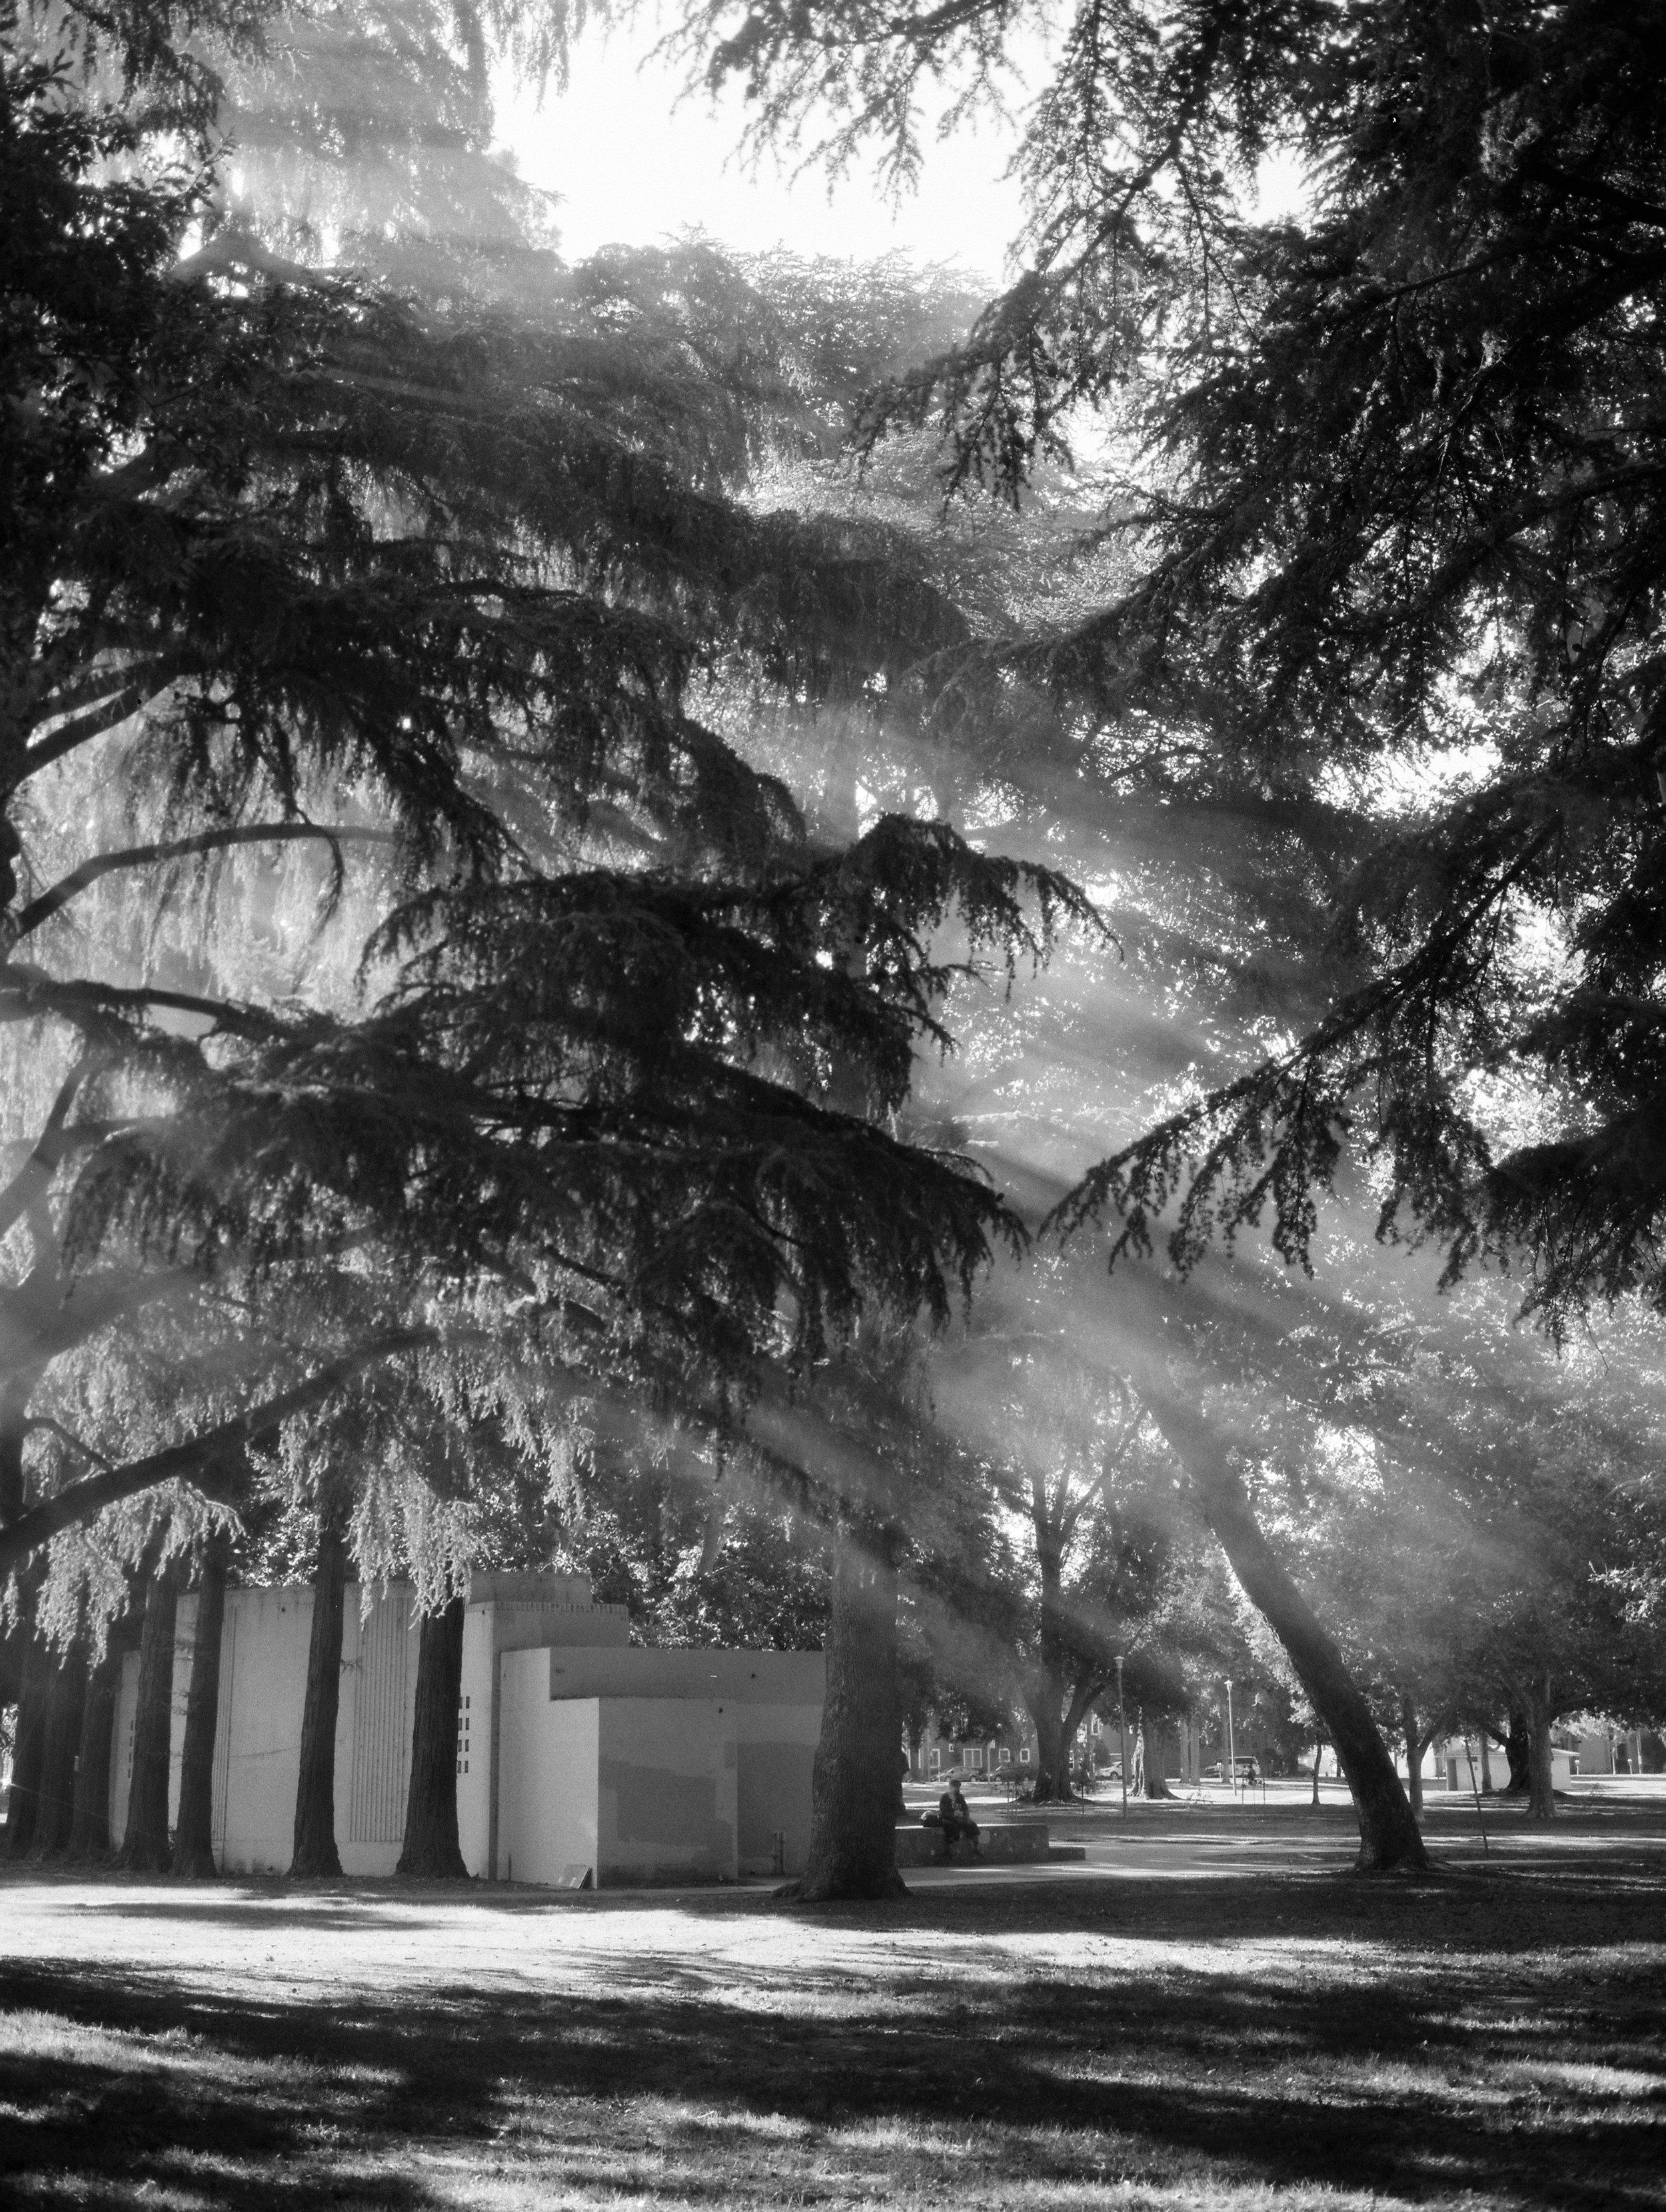 southsidepark-sacramento-blackandwhite-photography by Rachel Sima Photography